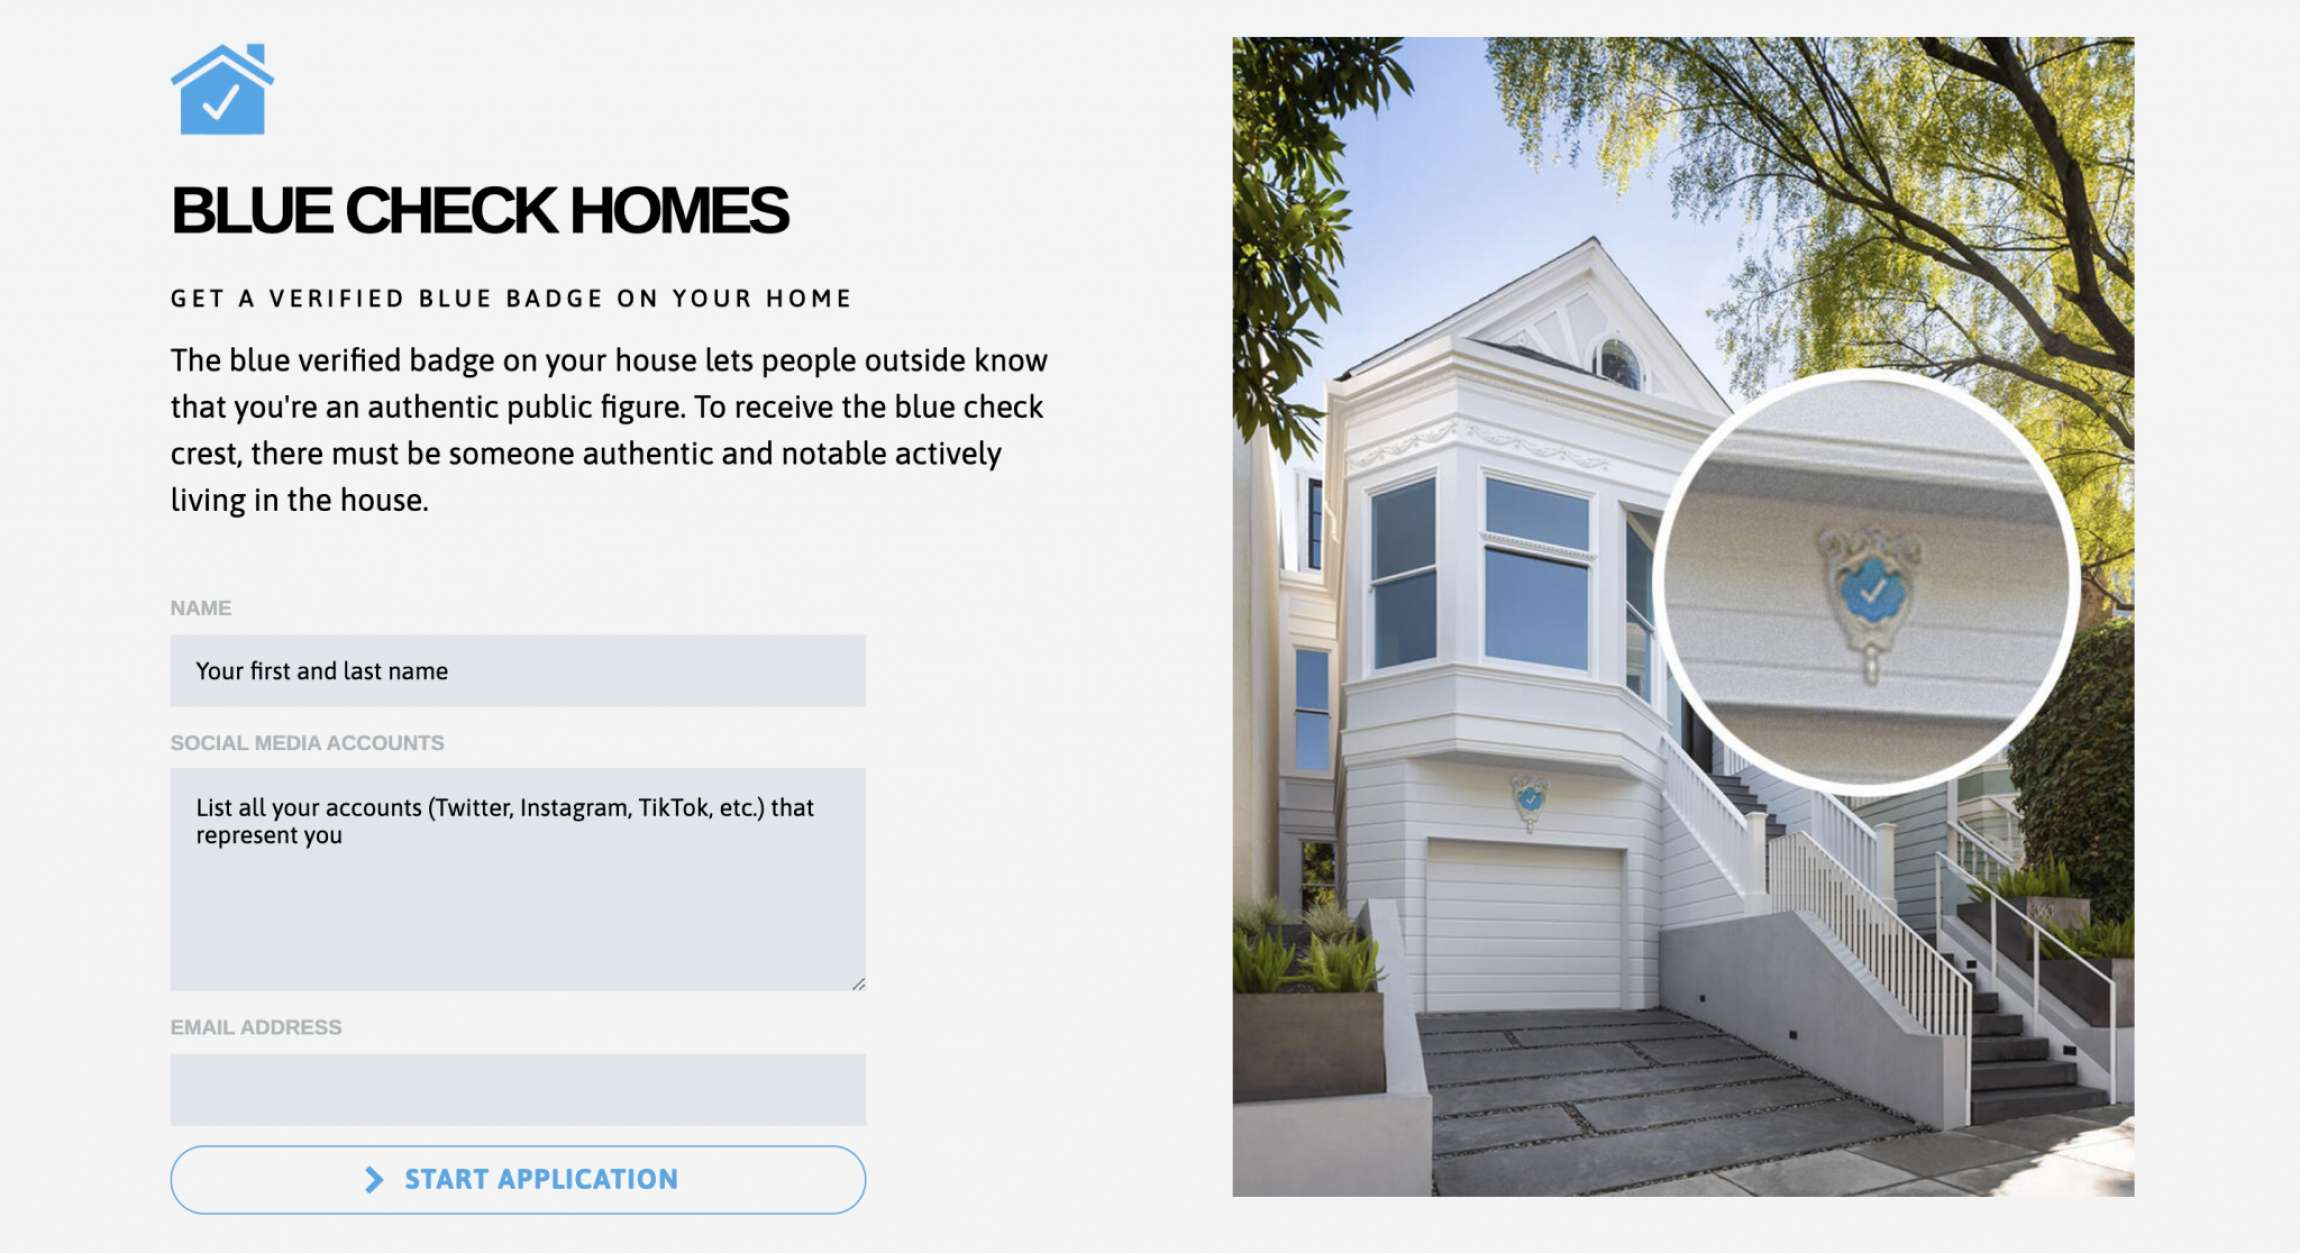 Blue Check Homes Courtesy of Danielle Baskin